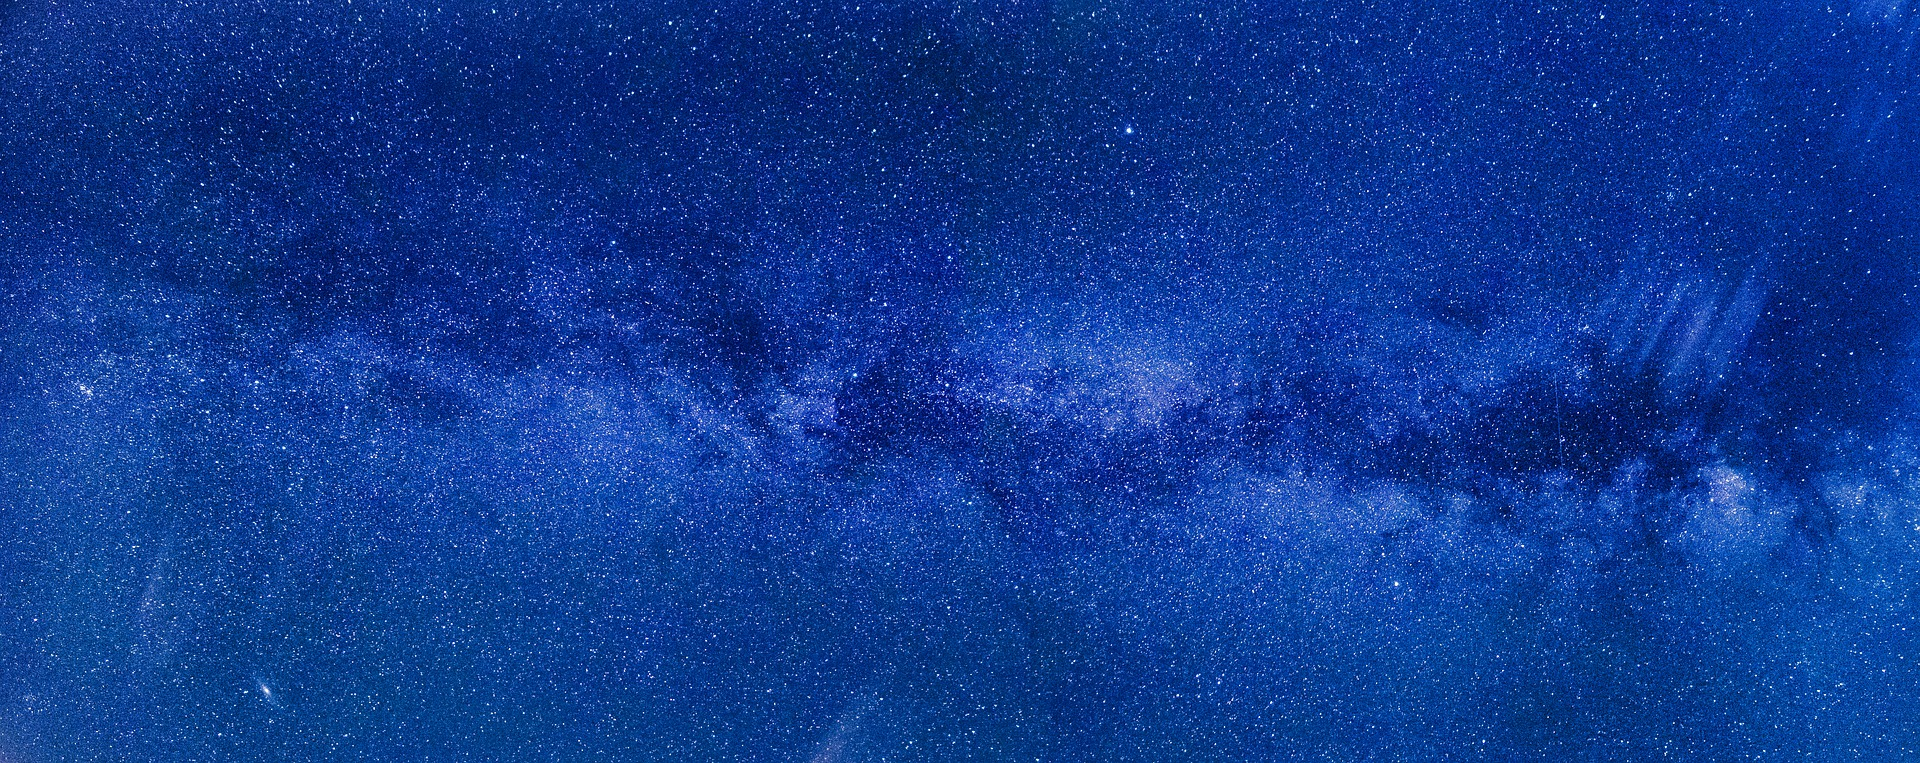 Astronomietag